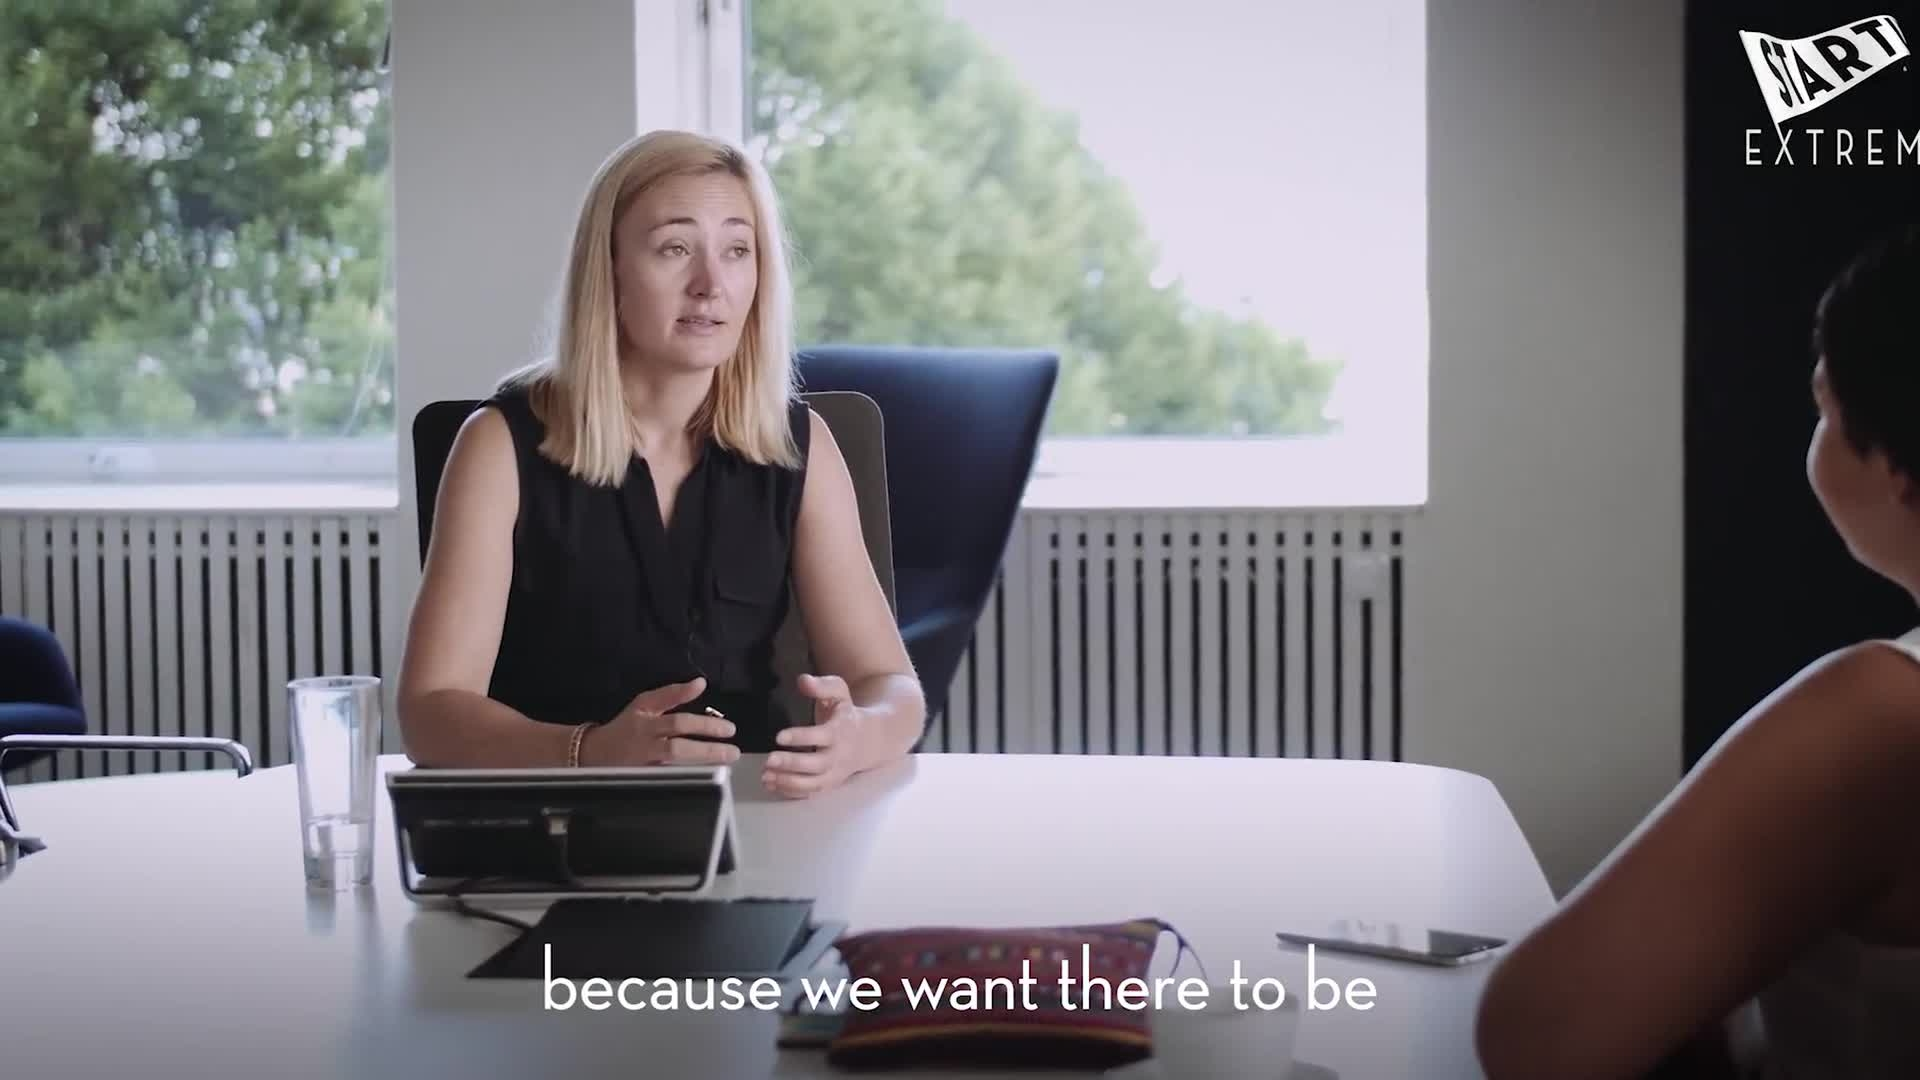 Startup Extreme testimonial, Argentum